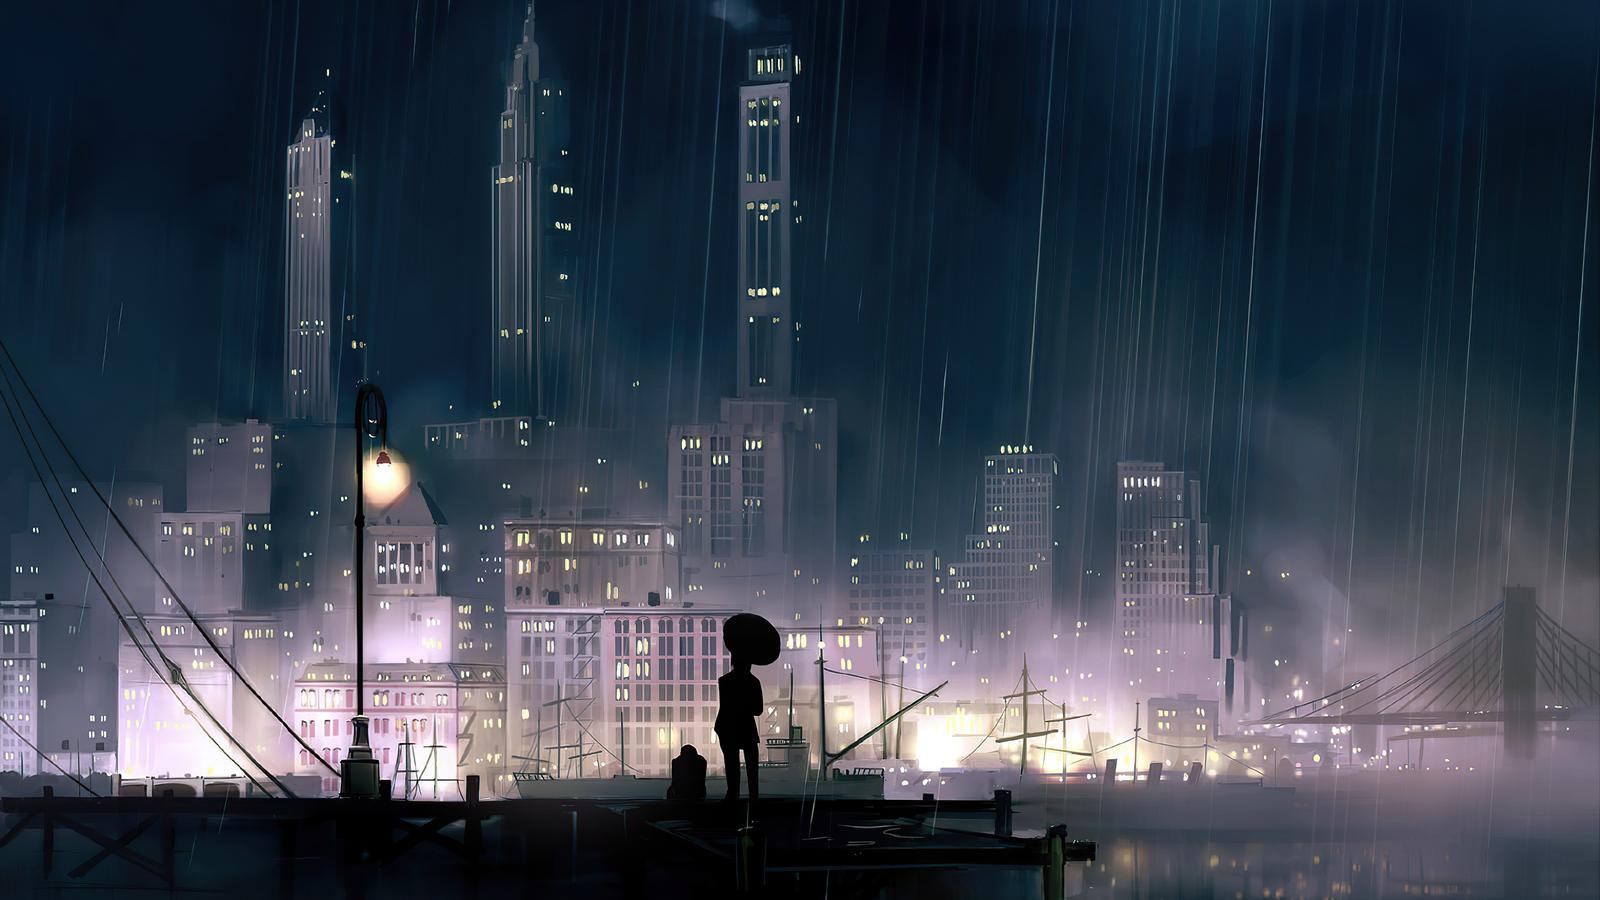 anime-background-city-night-4k-pb.jpg